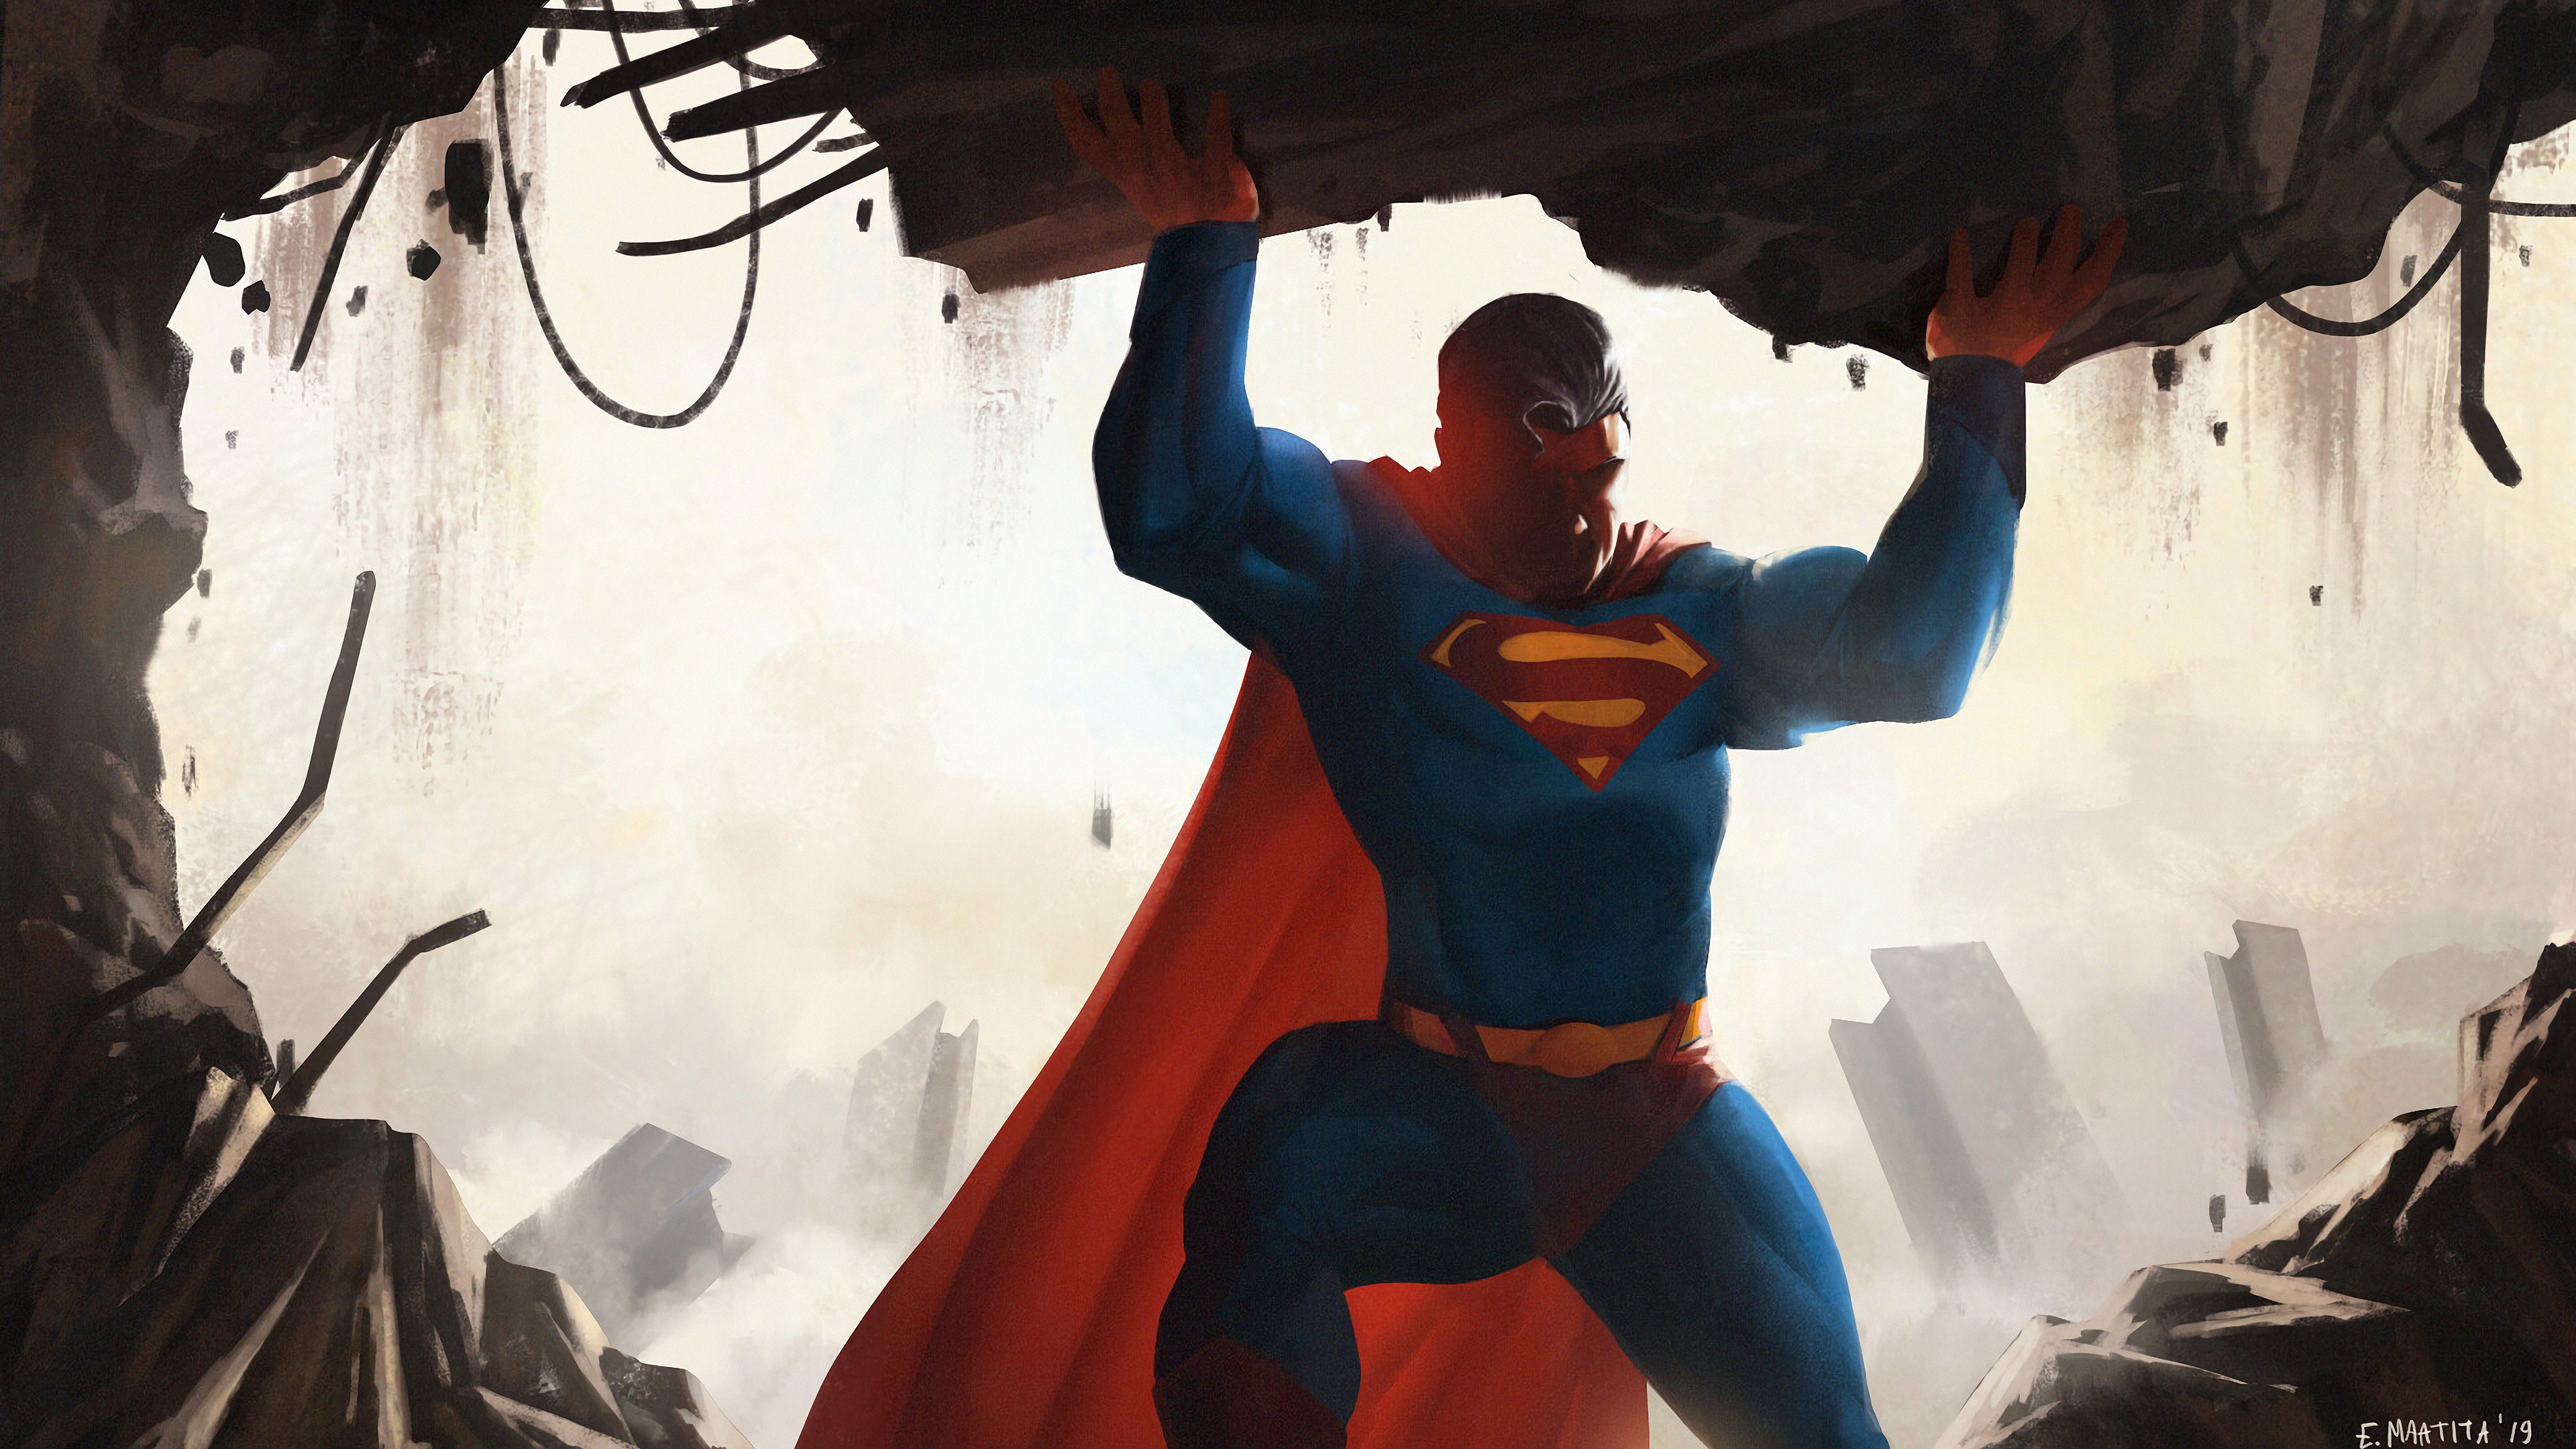 superman saving 1569186761 - Superman Saving - superman wallpapers, superheroes wallpapers, hd-wallpapers, digital art wallpapers, batman wallpapers, artwork wallpapers, artstation wallpapers, 4k-wallpapers